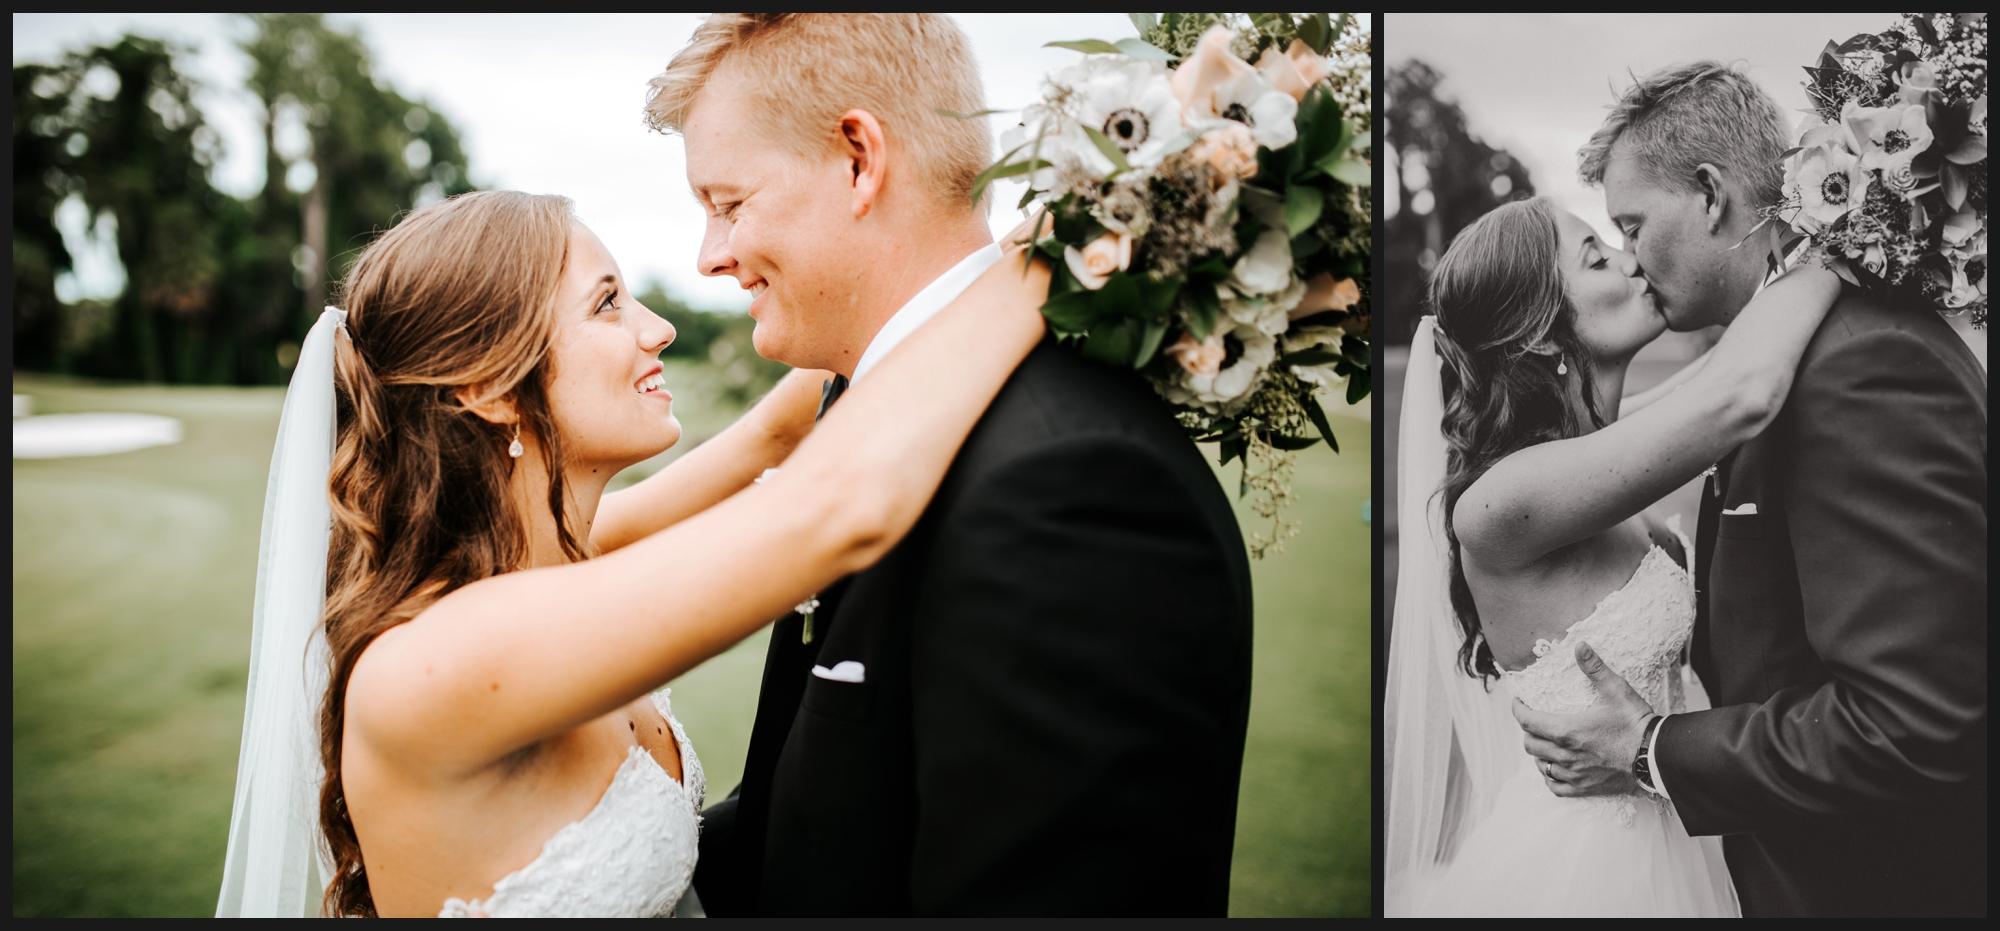 Orlando-Wedding-Photographer-destination-wedding-photographer-florida-wedding-photographer-bohemian-wedding-photographer_0008.jpg